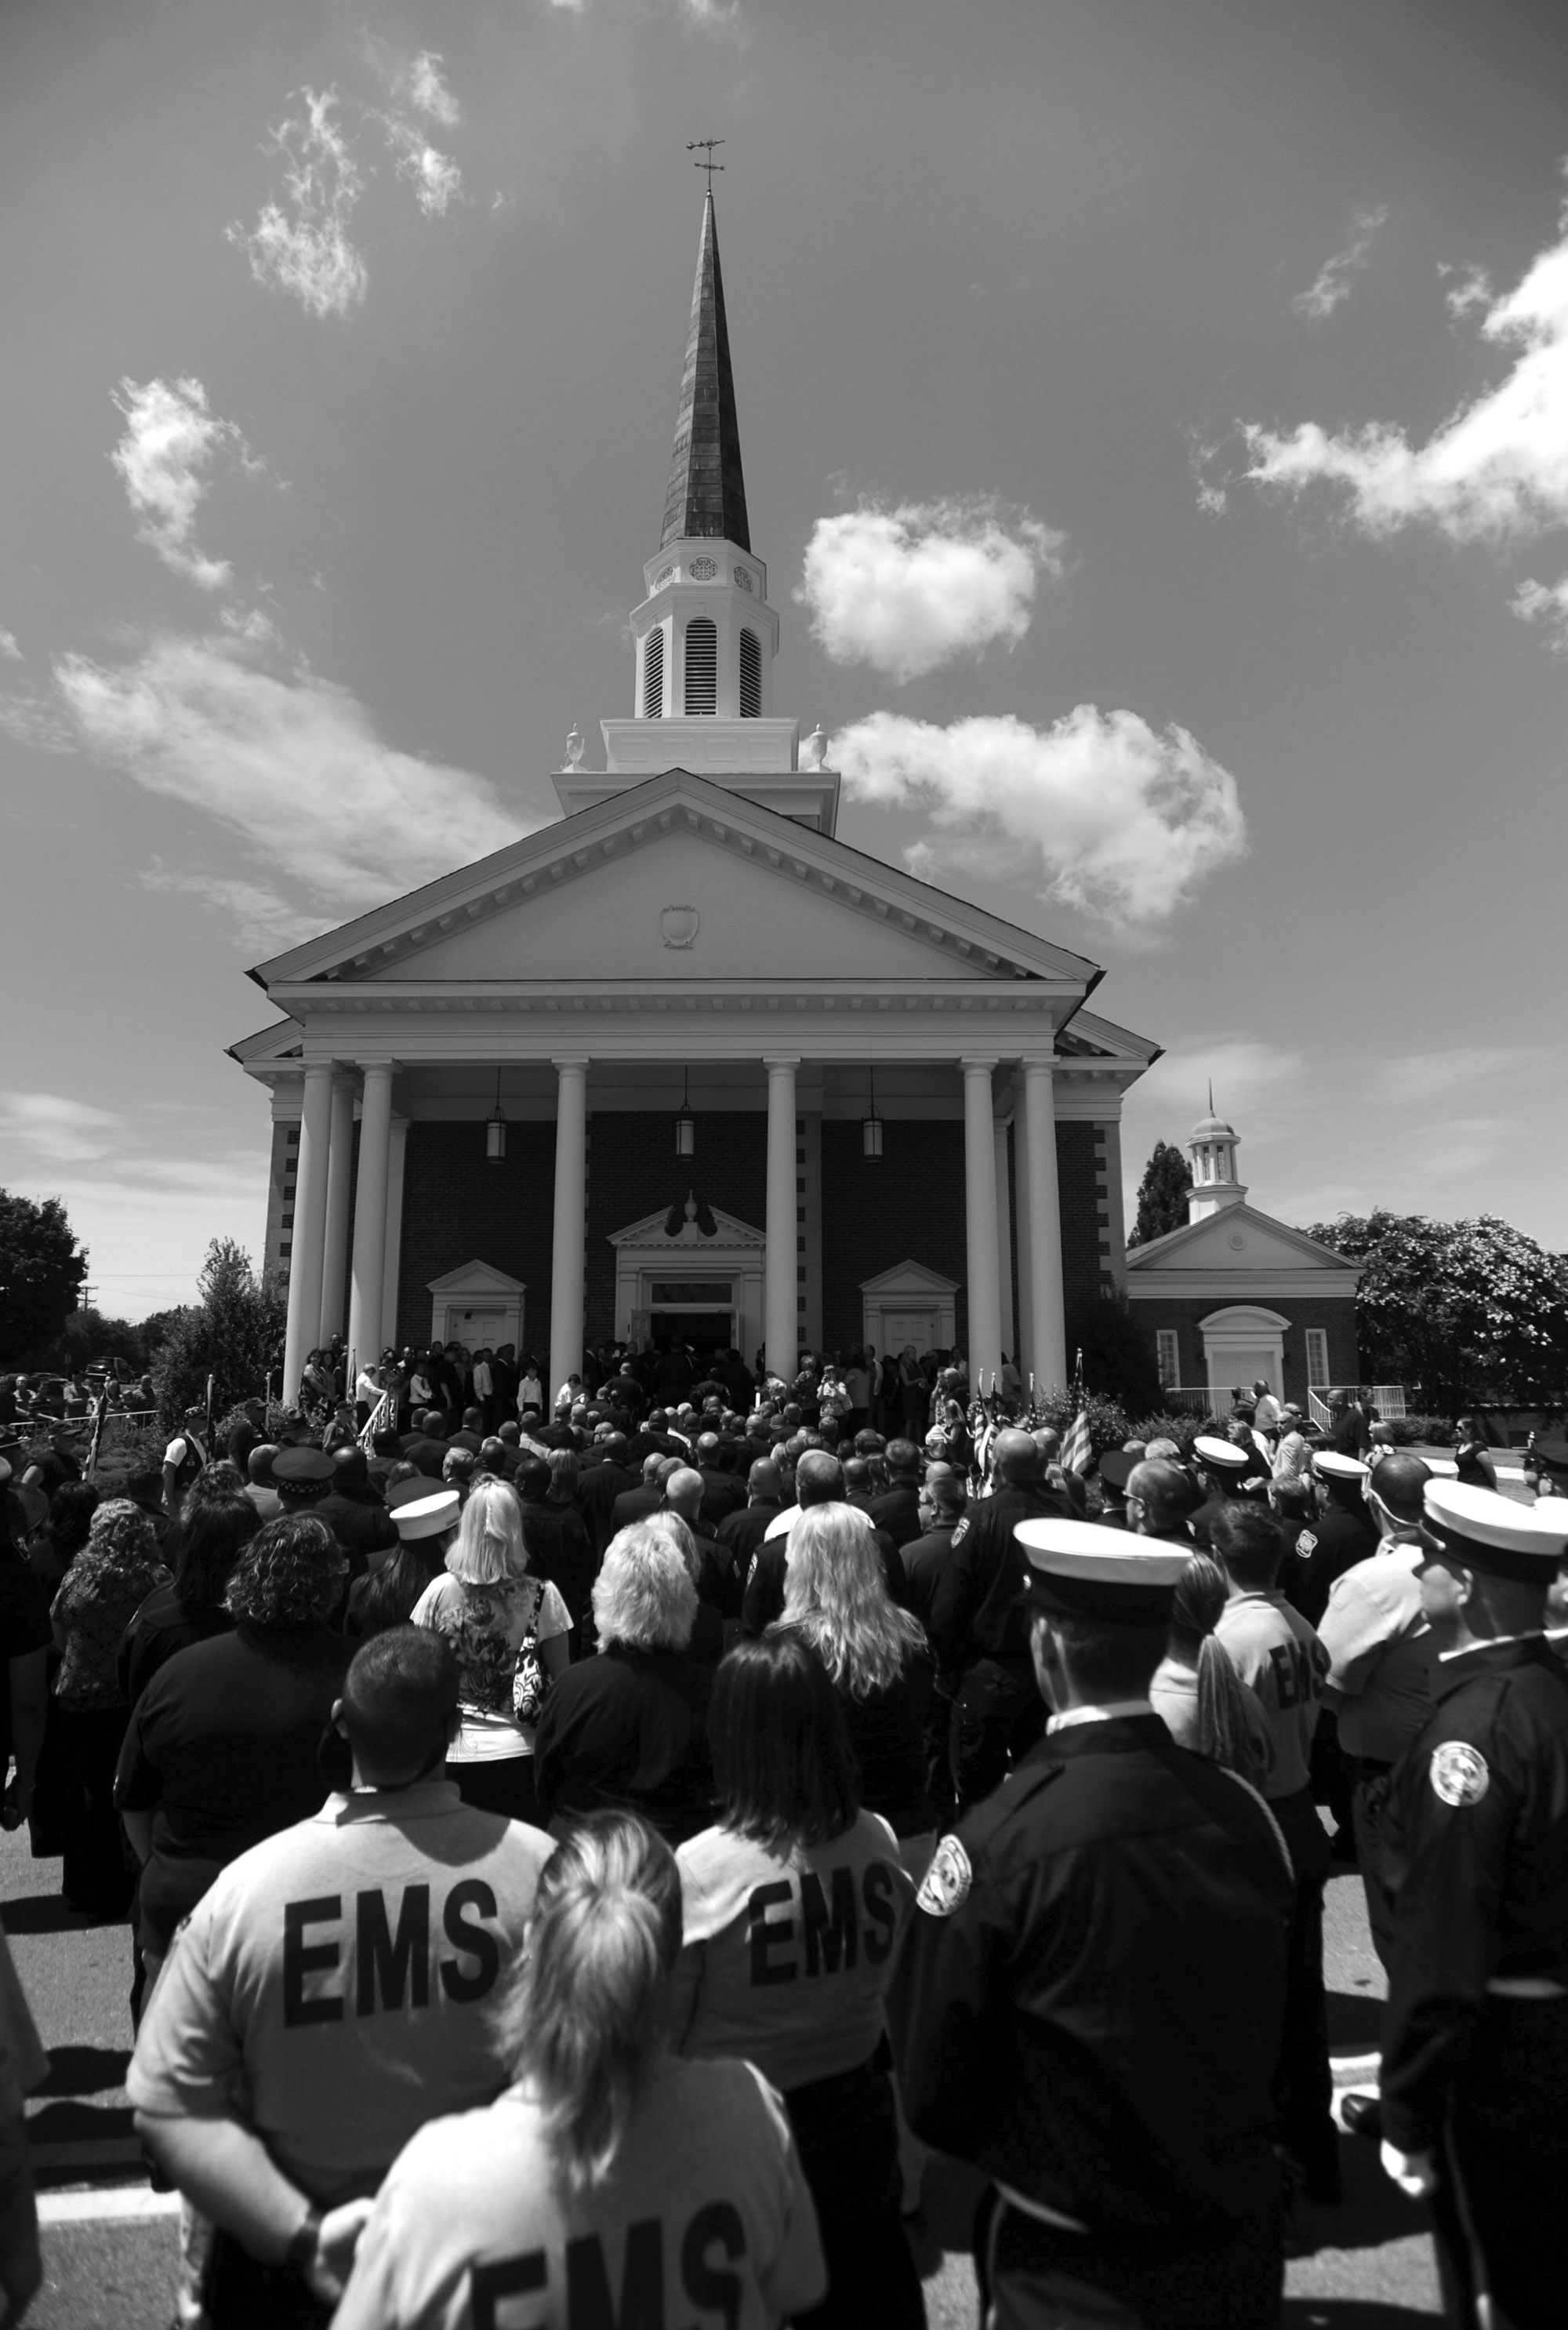 BW_DeputyKilled_Funeral 08.jpg